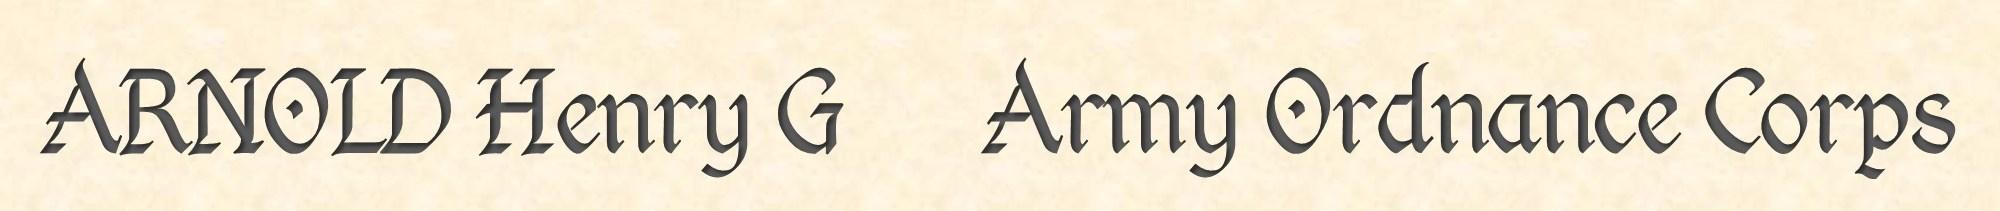 Henry Arnold header